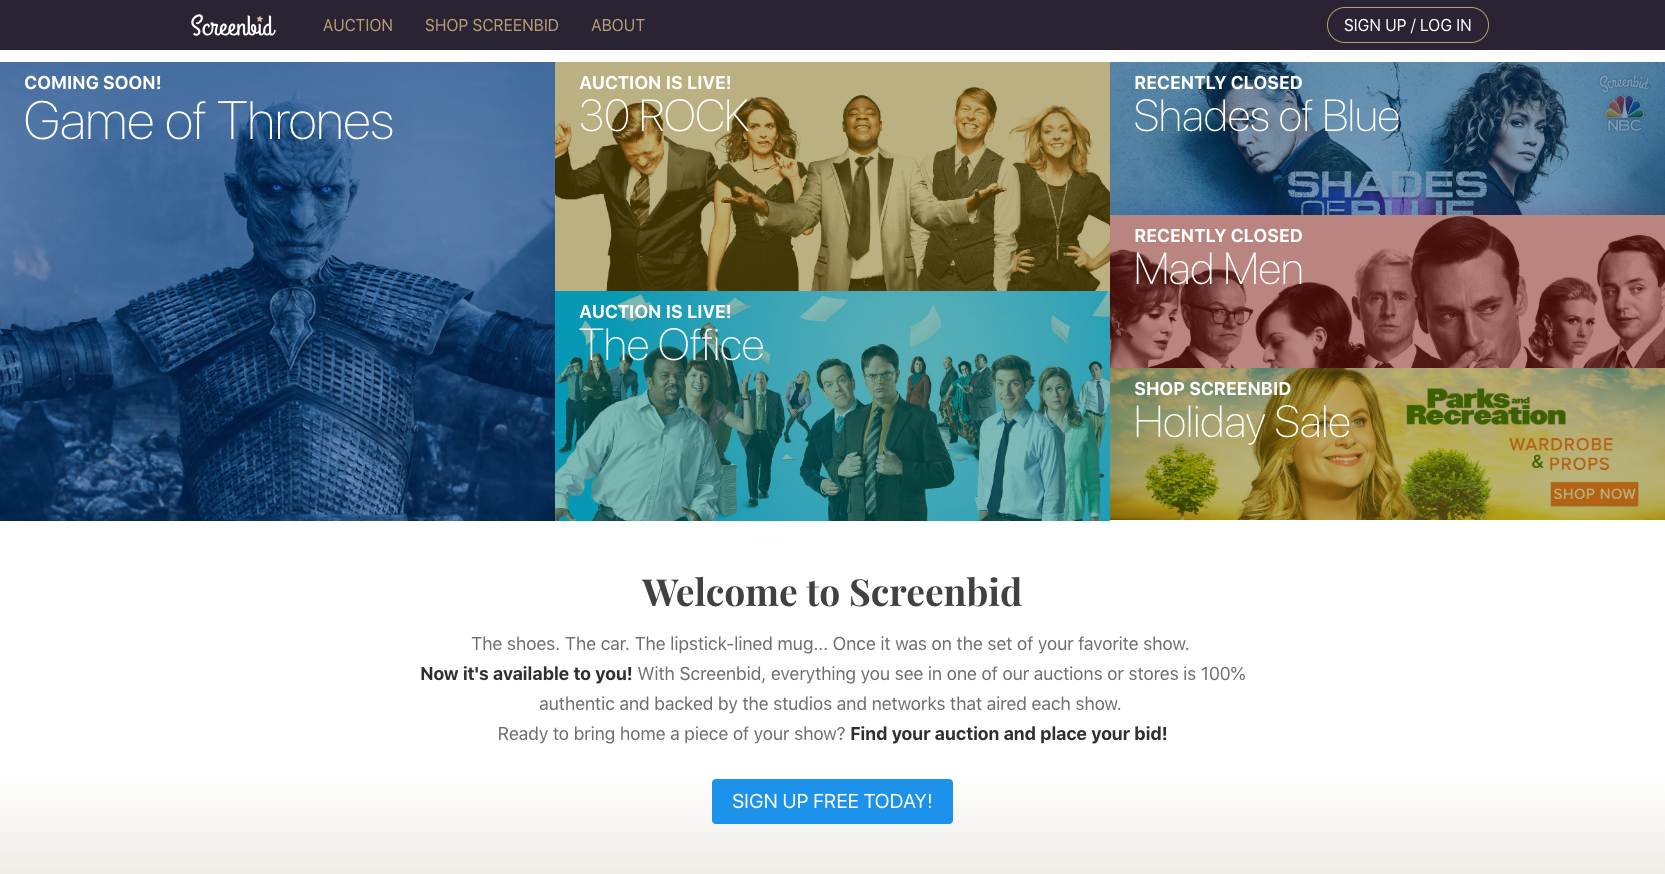 screenbid-new-hp-comp.png